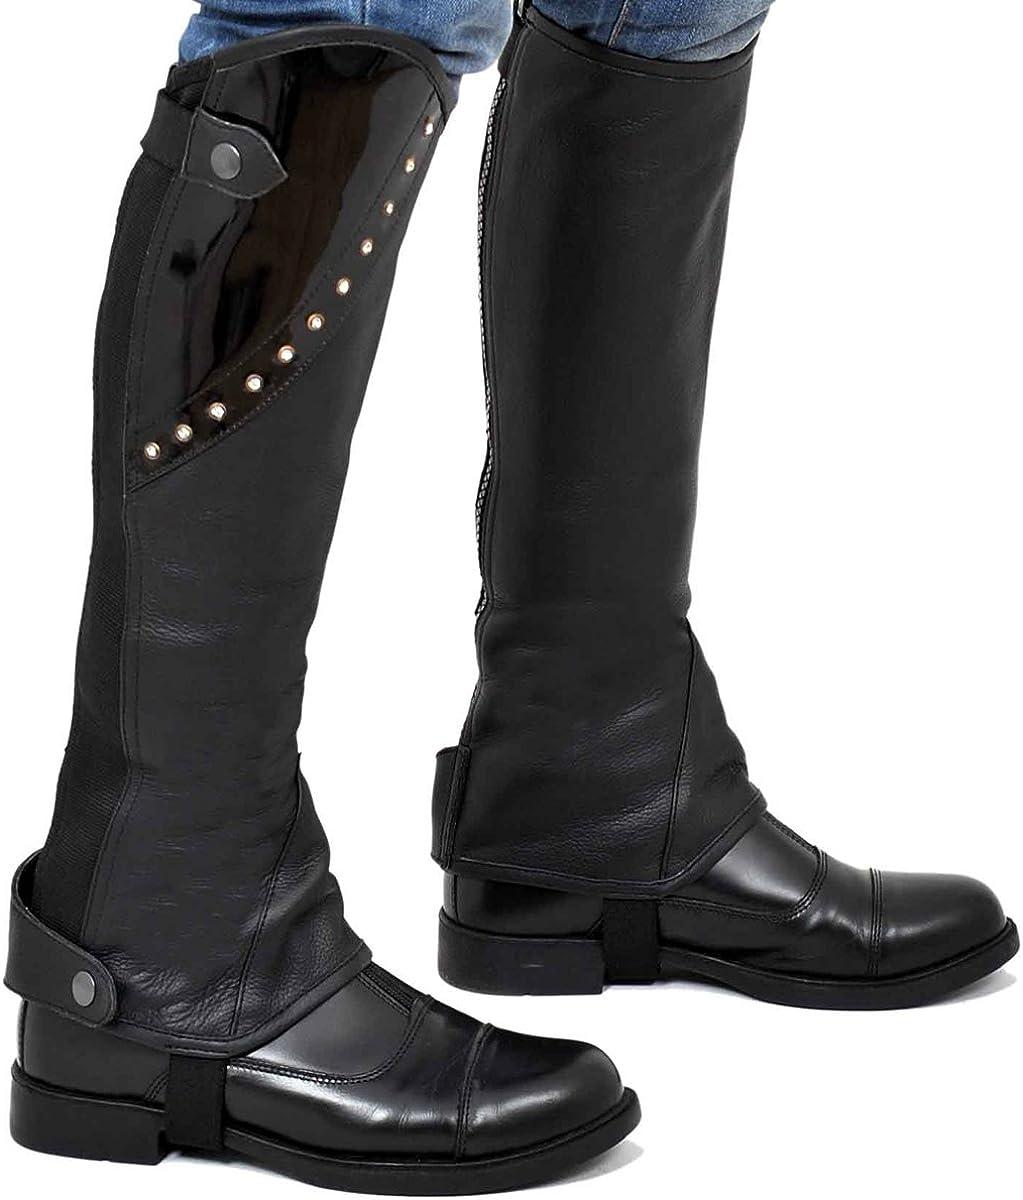 Calzado Riders Trend 10025184-BLK-XS